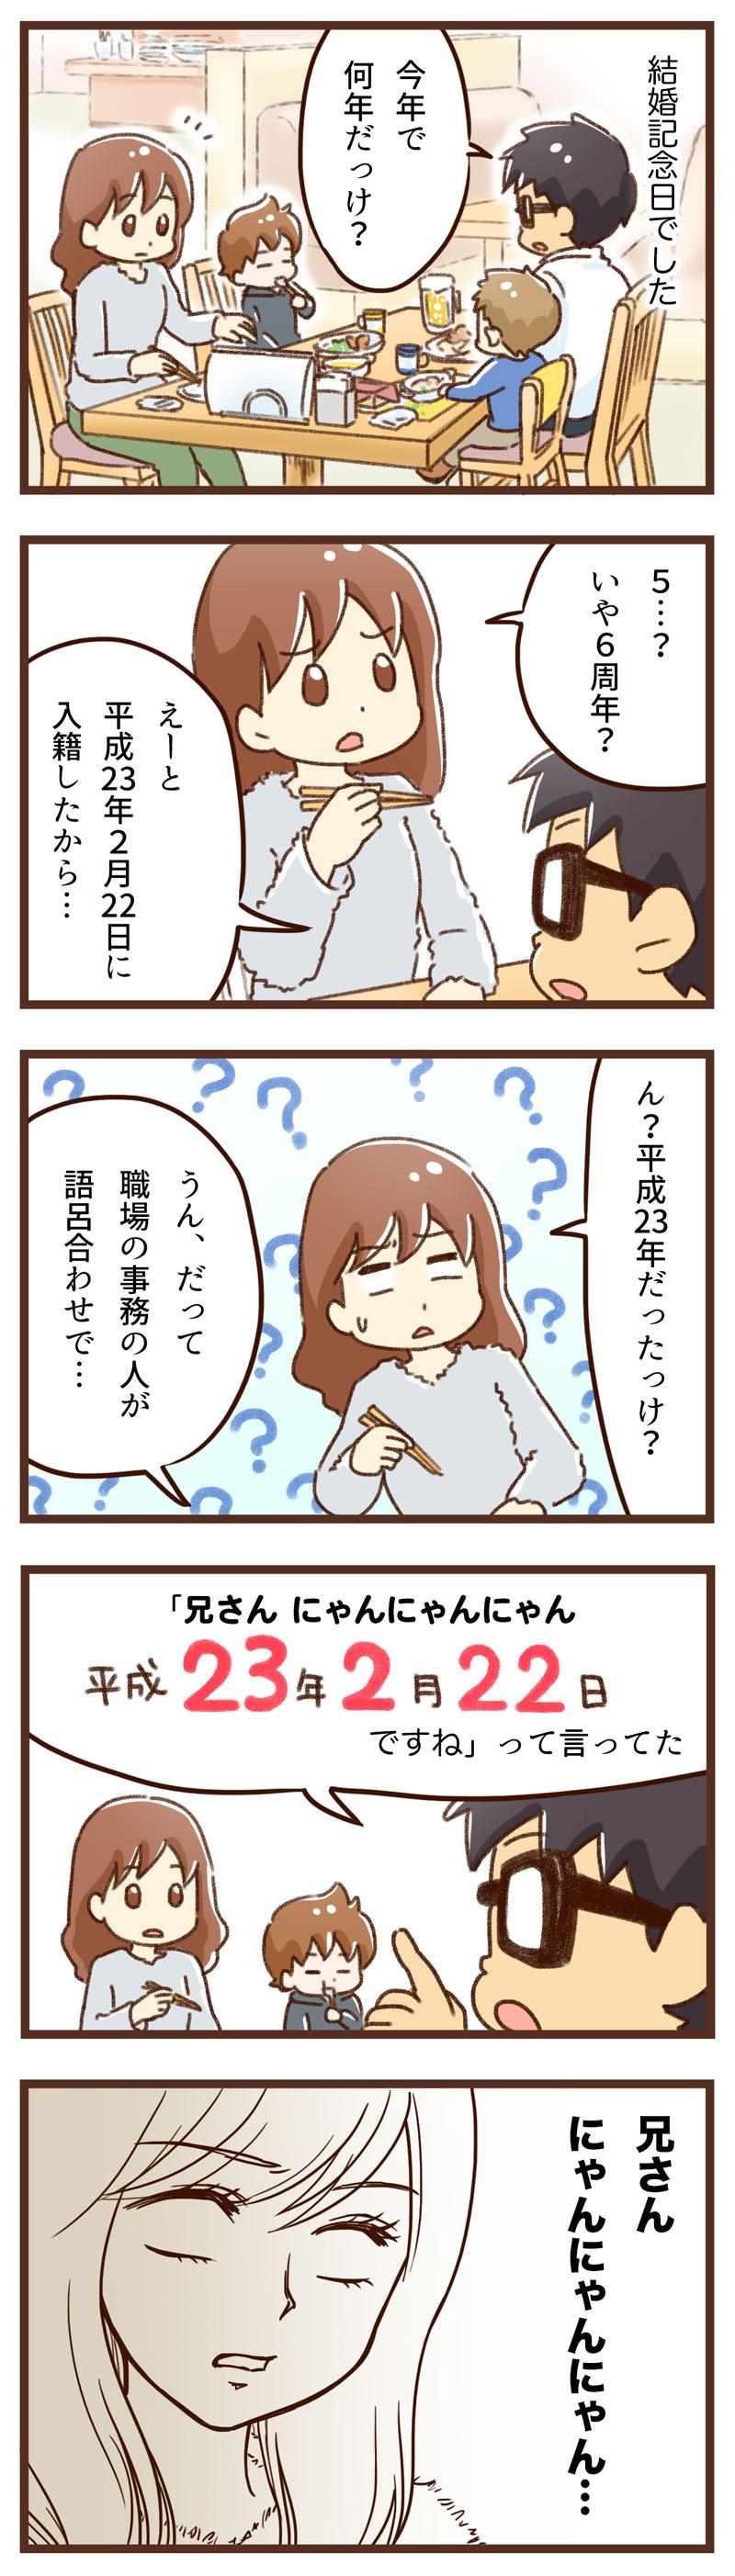 yumui253-4